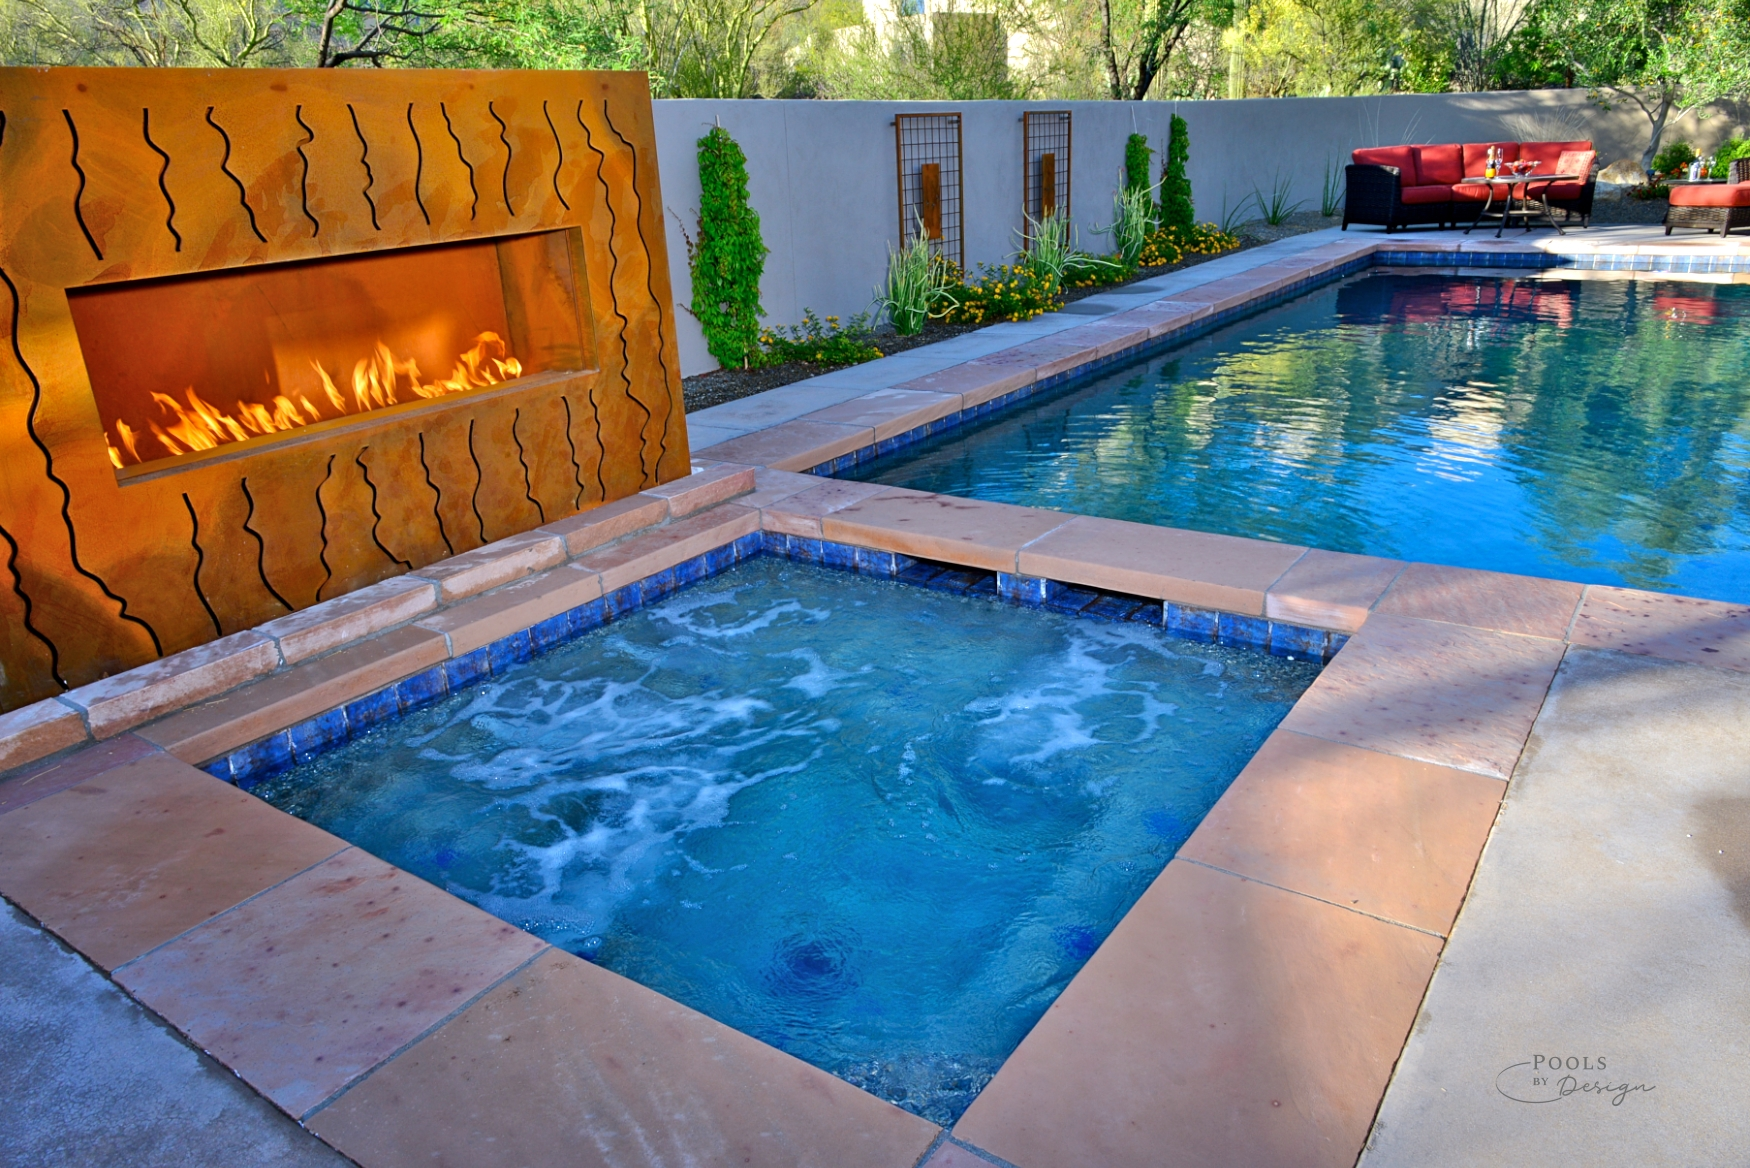 Amazing Pools By Design